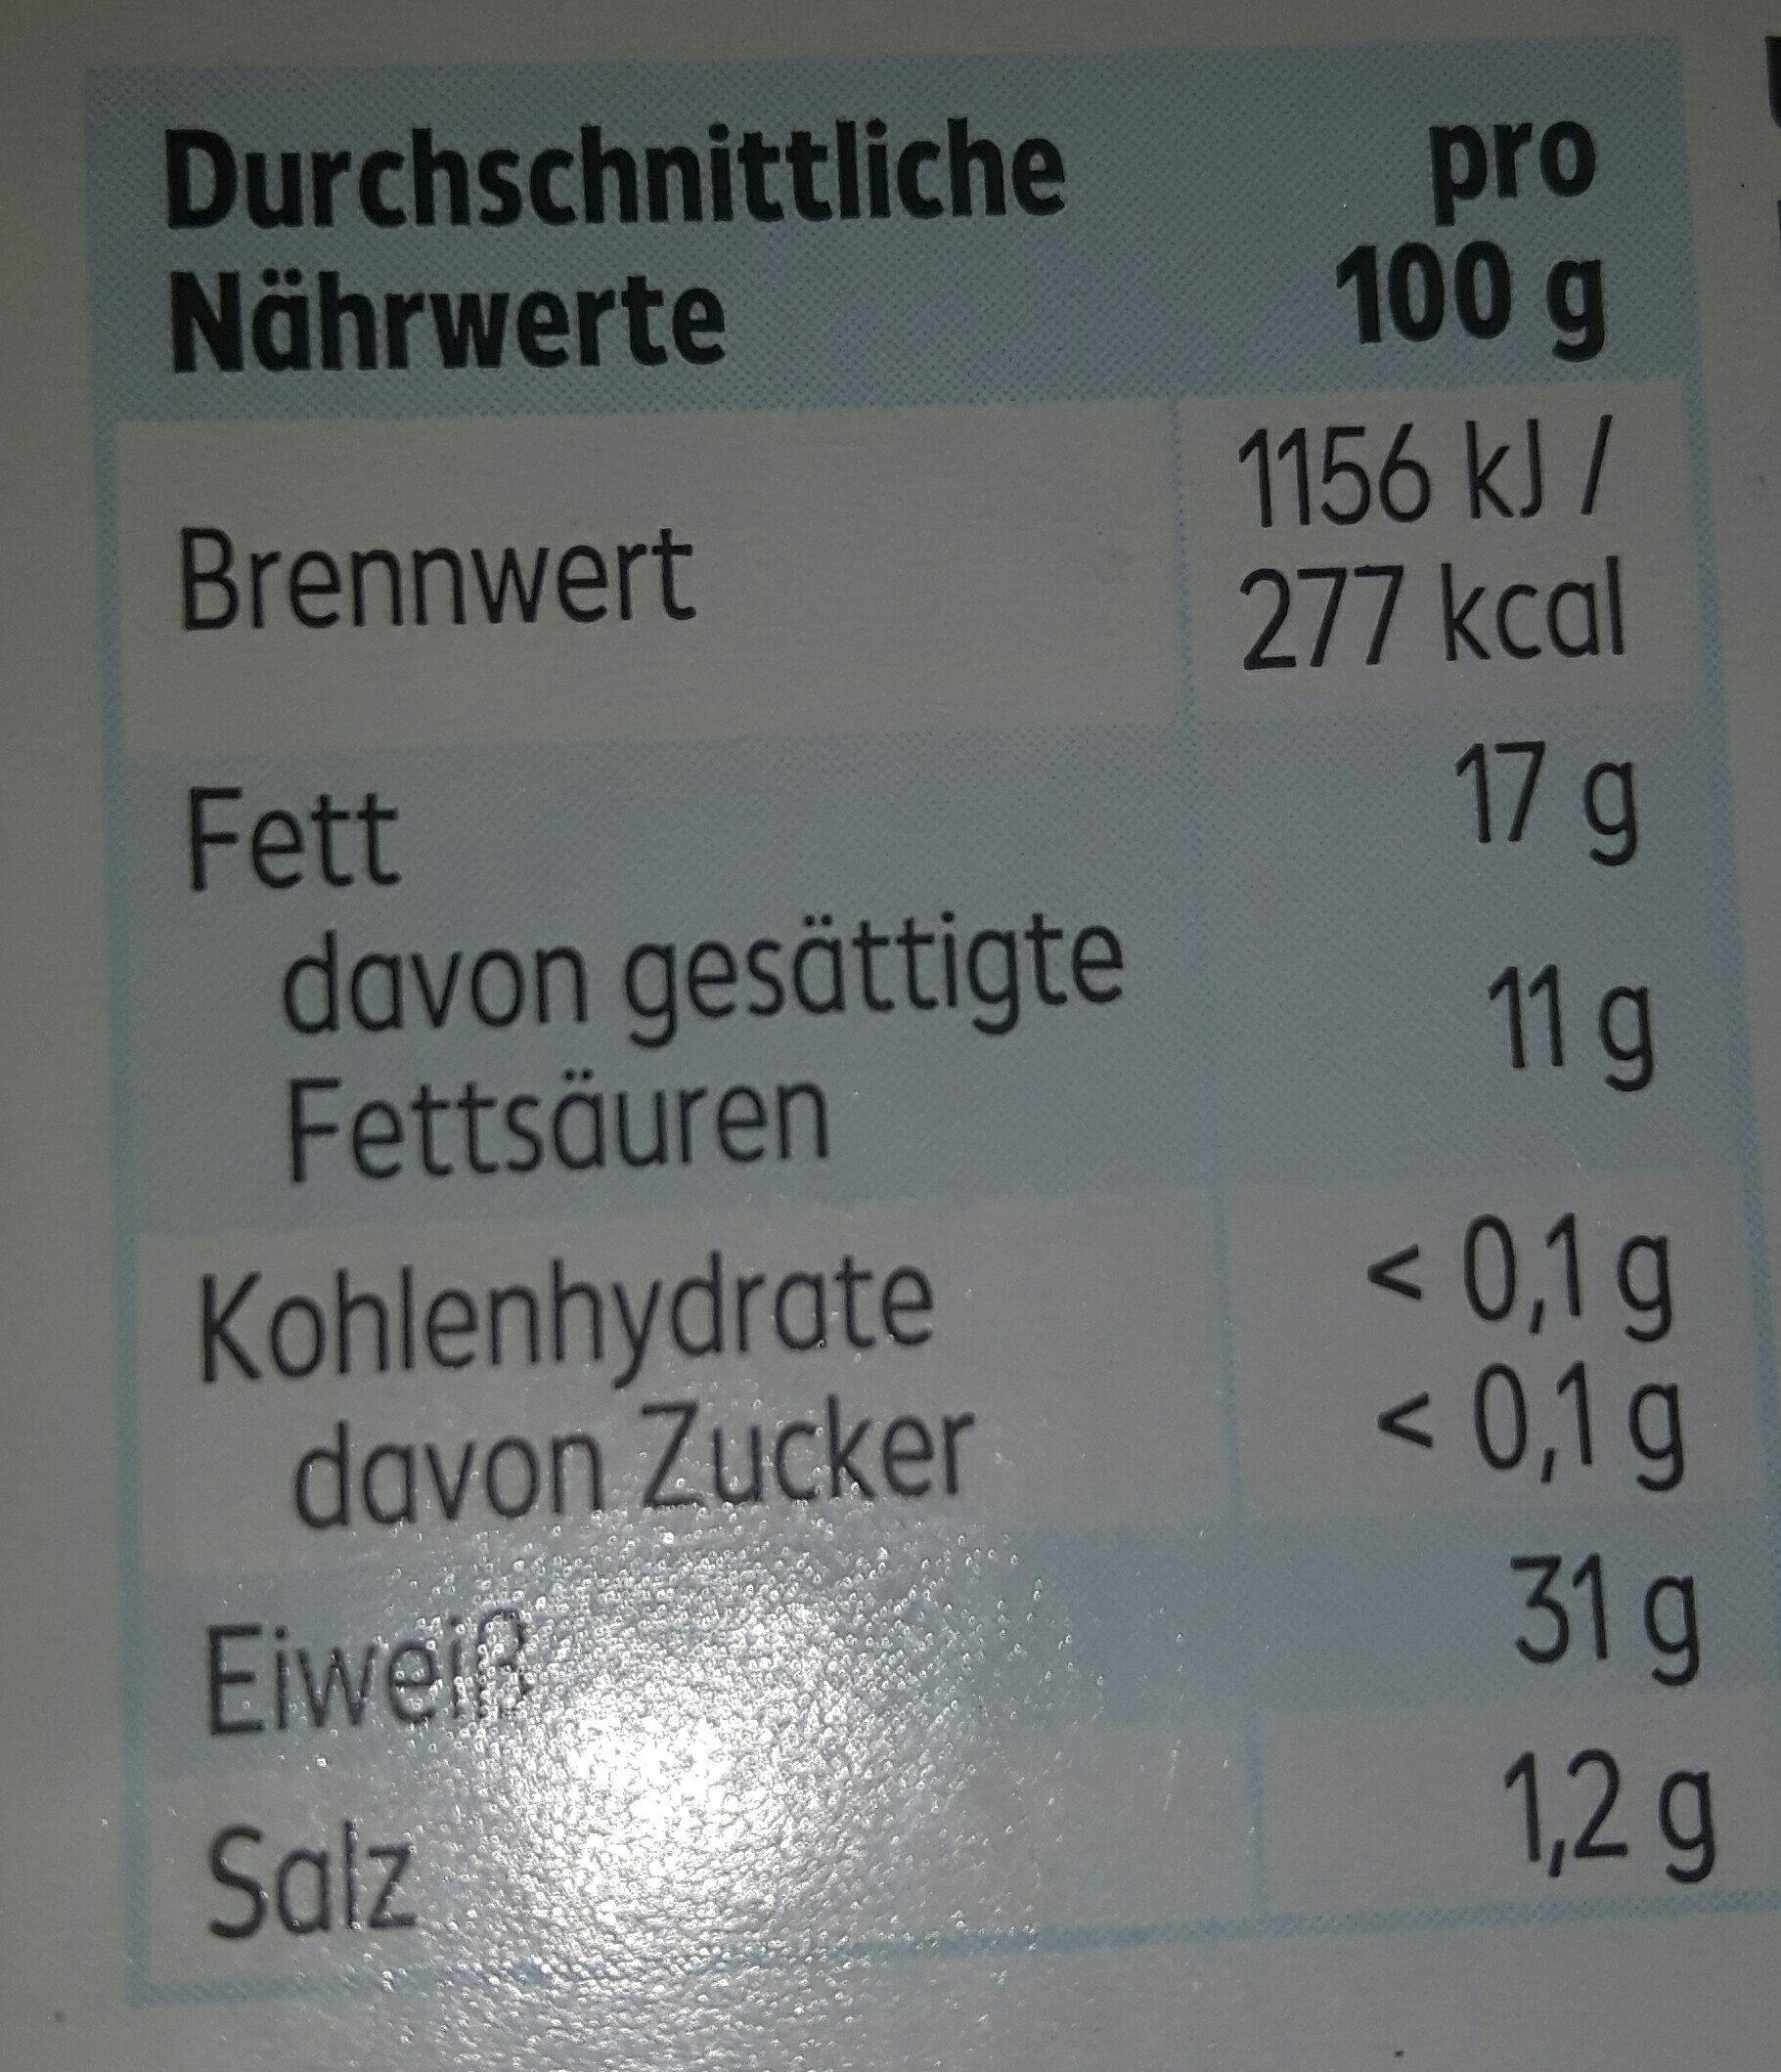 Maasdamer - Nutrition facts